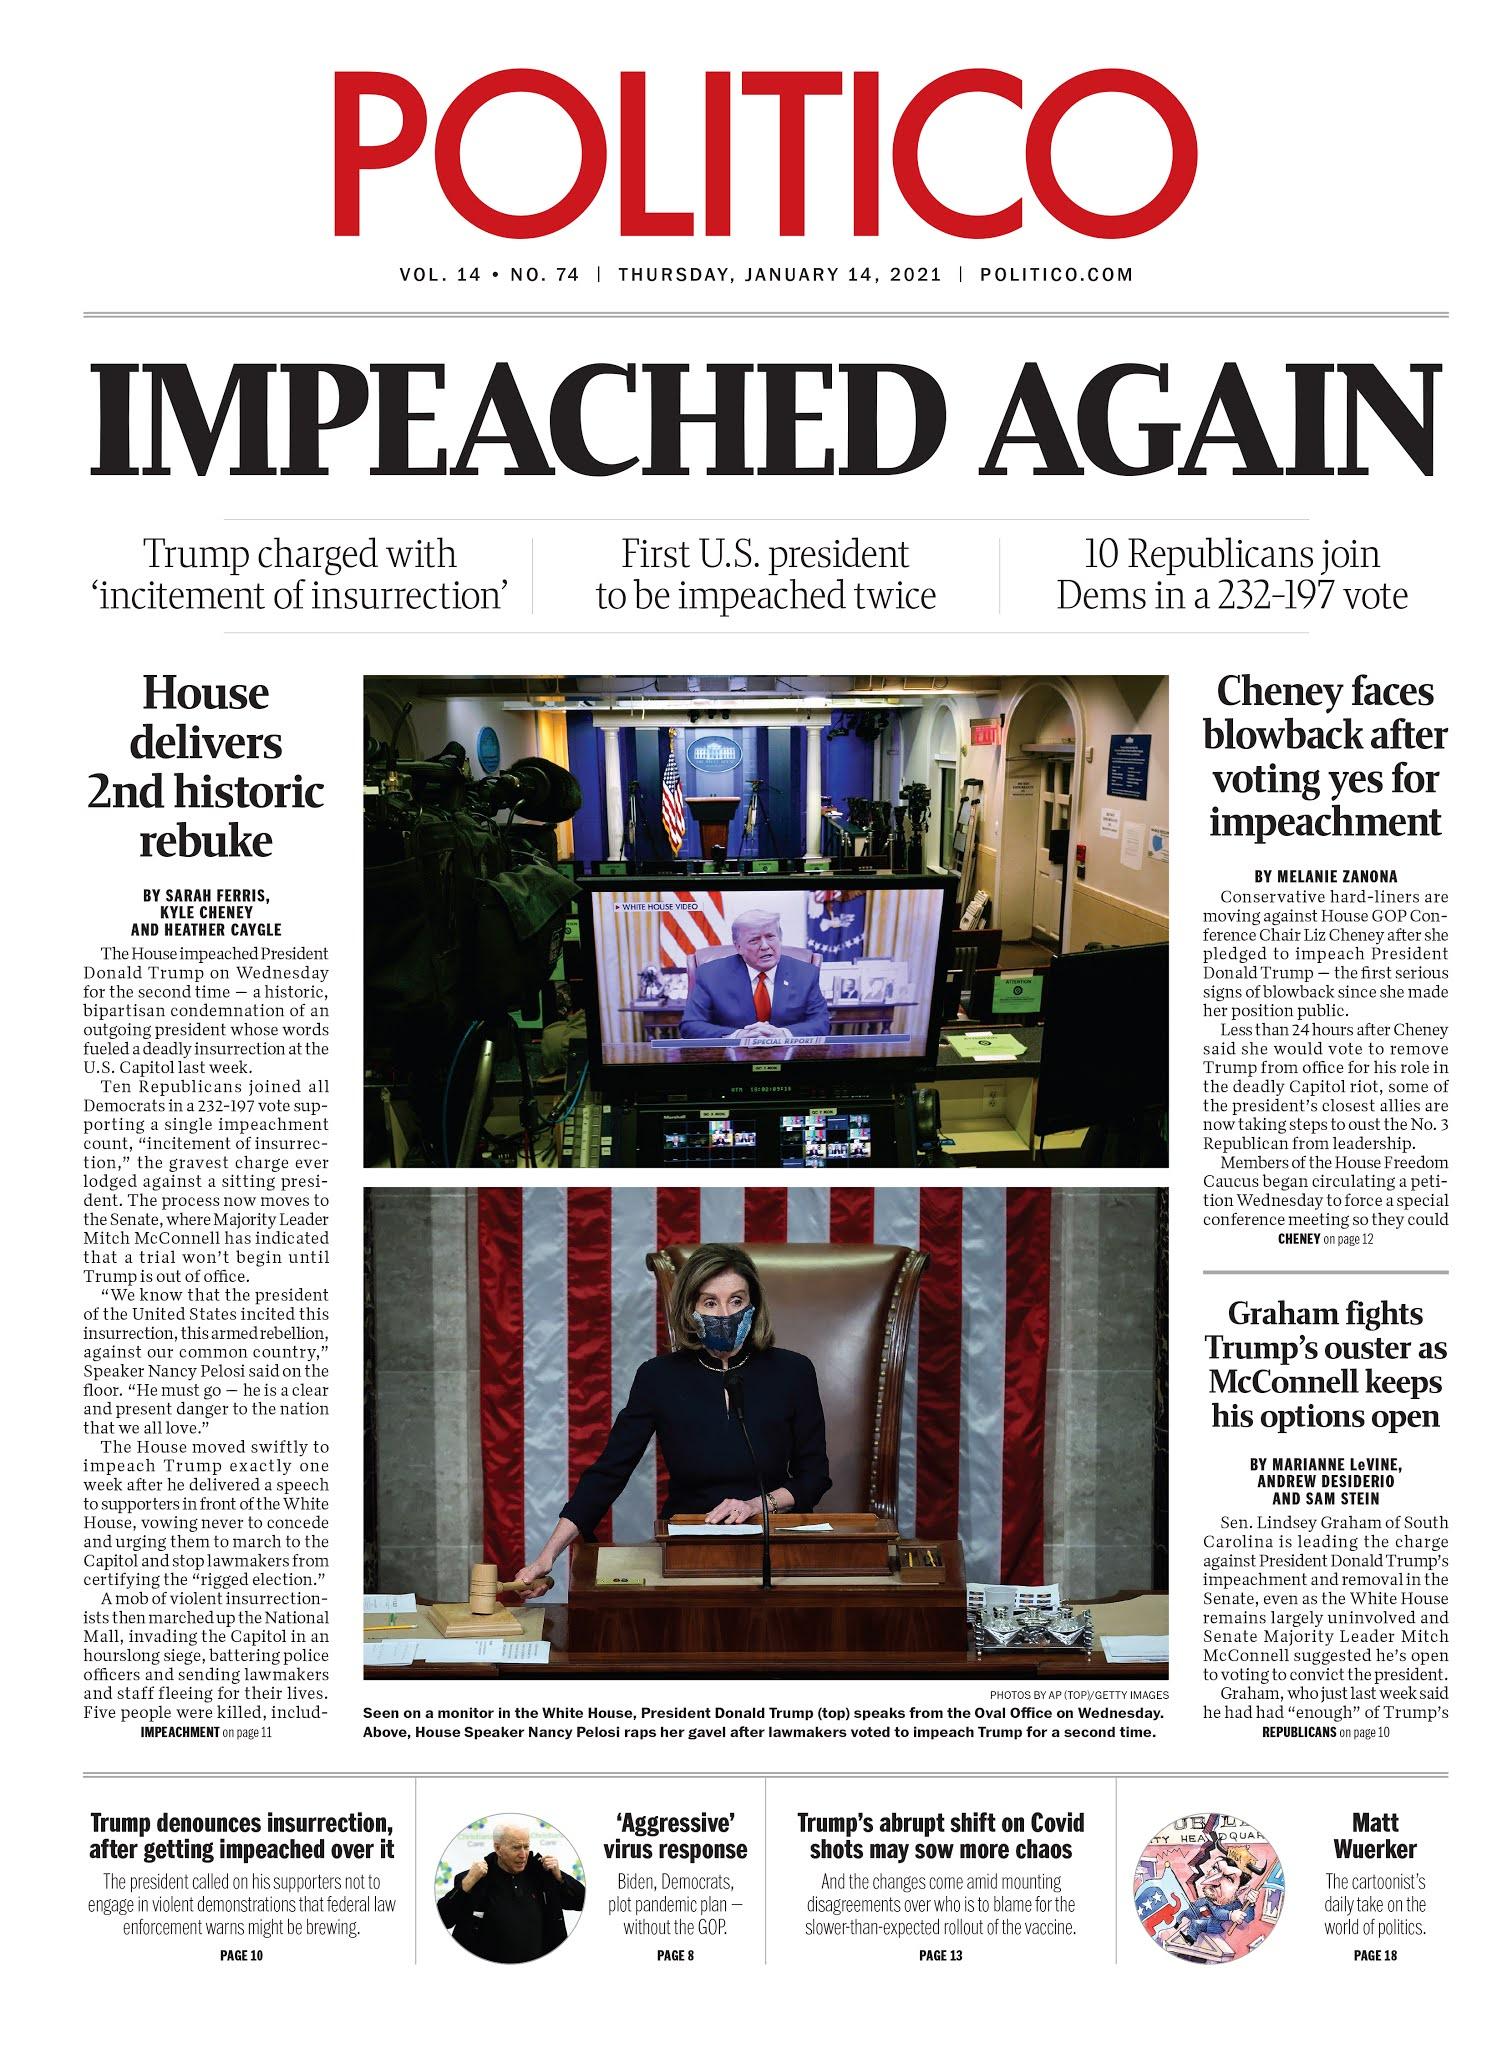 Impeached again